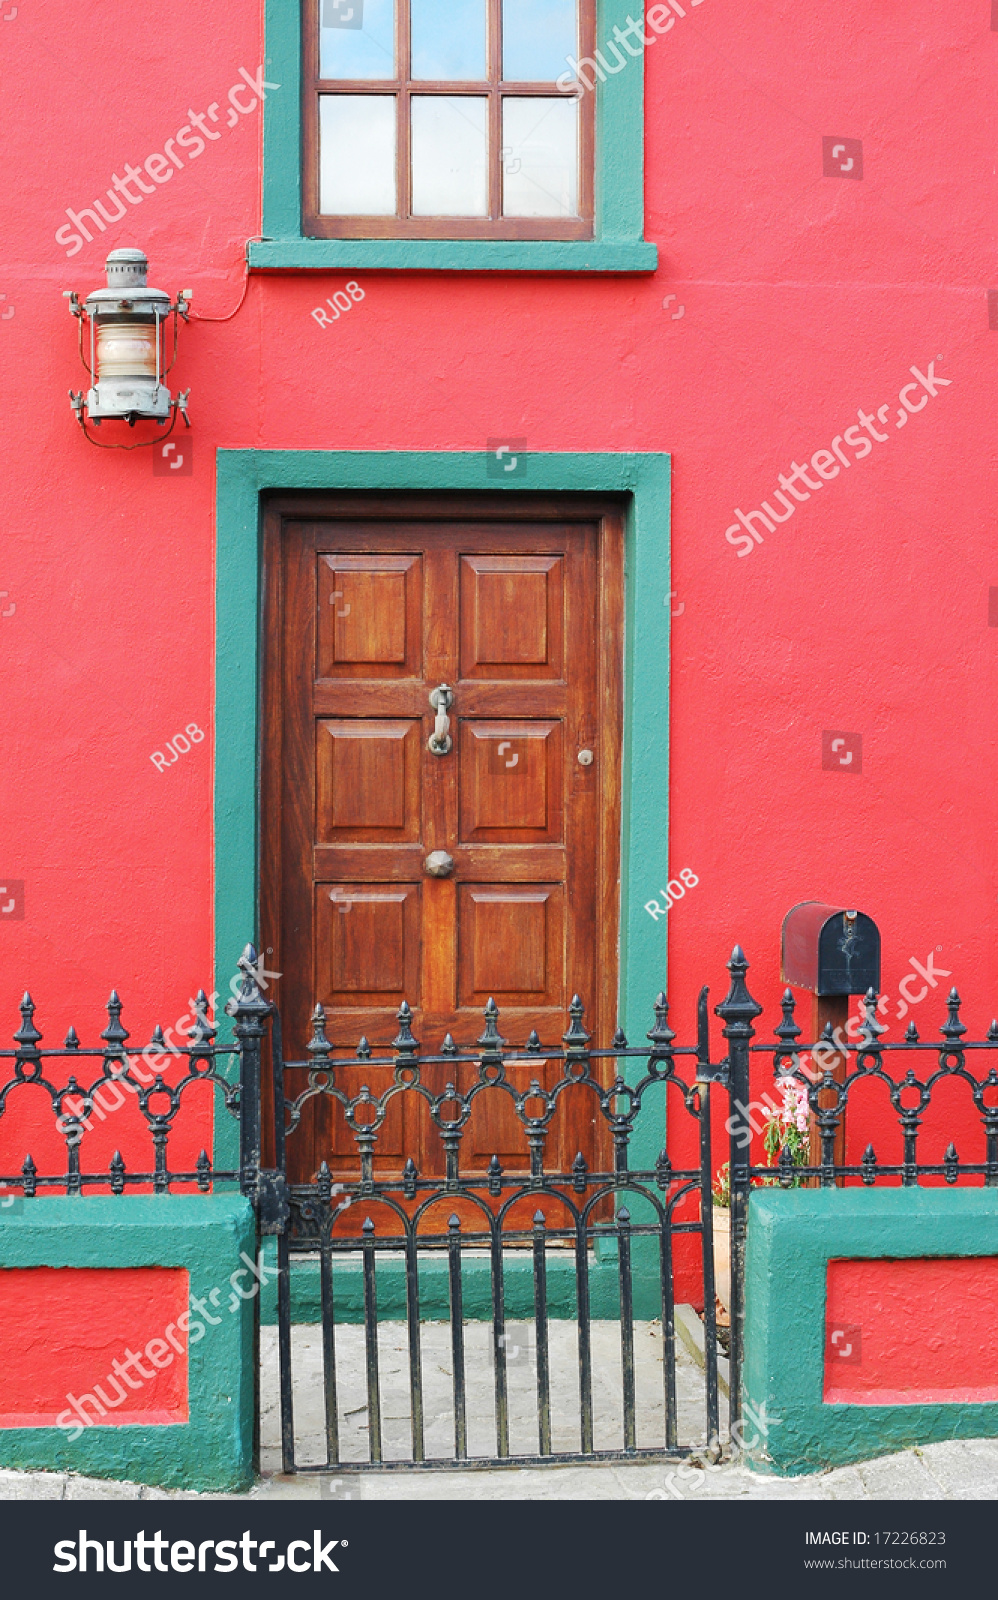 Irish Door & Irish Door Stock Photo (Royalty Free) 17226823 - Shutterstock